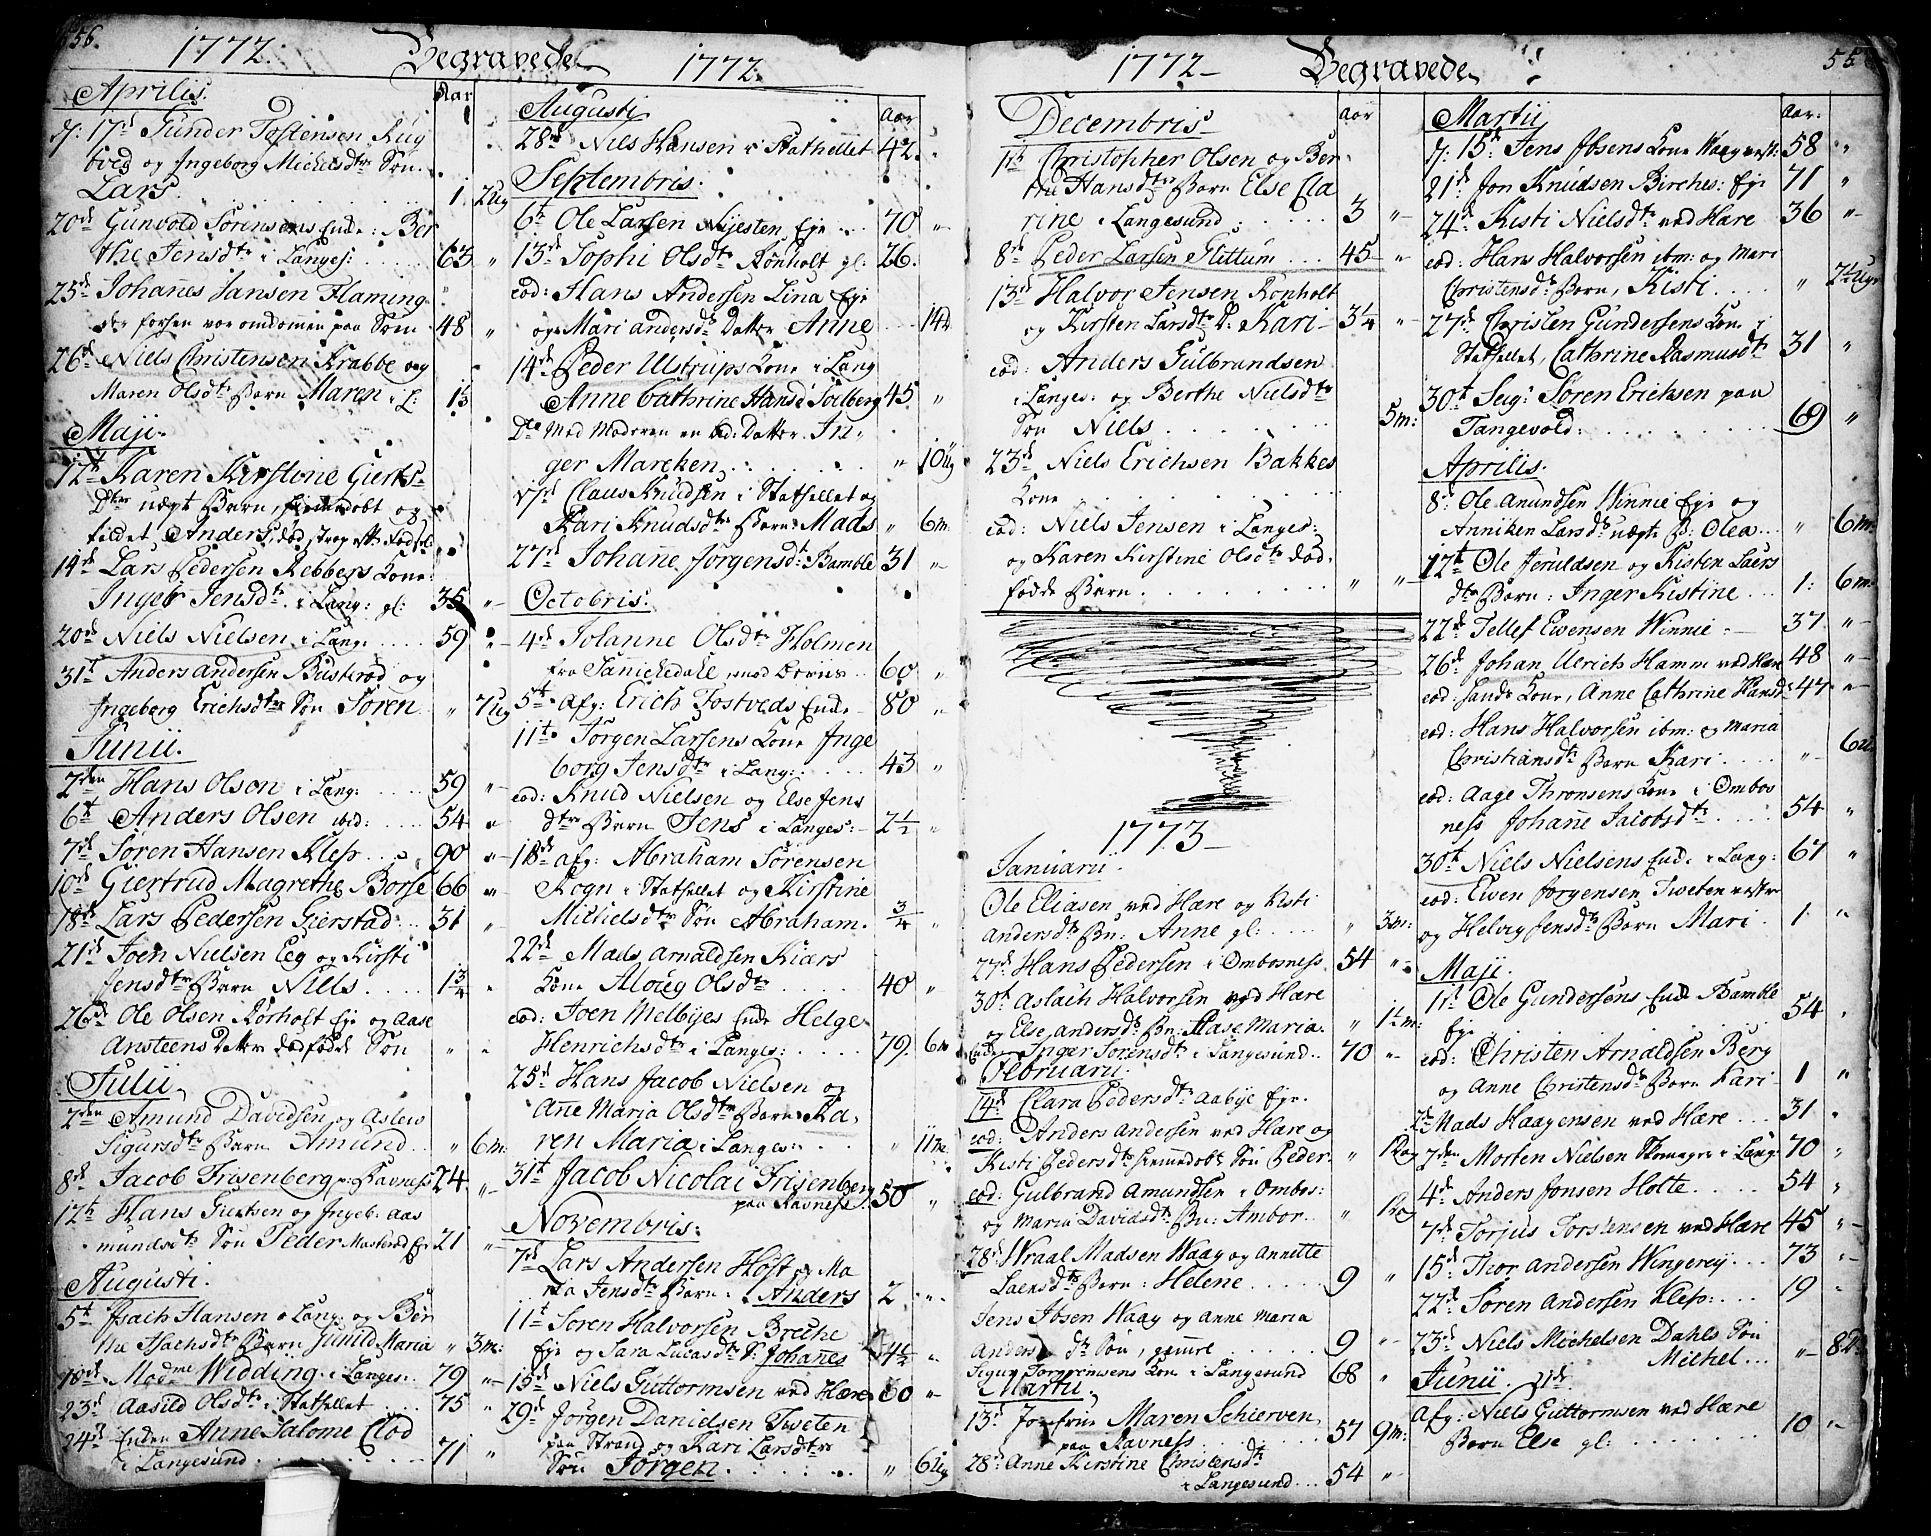 SAKO, Bamble kirkebøker, F/Fa/L0001: Ministerialbok nr. I 1, 1702-1774, s. 556-557